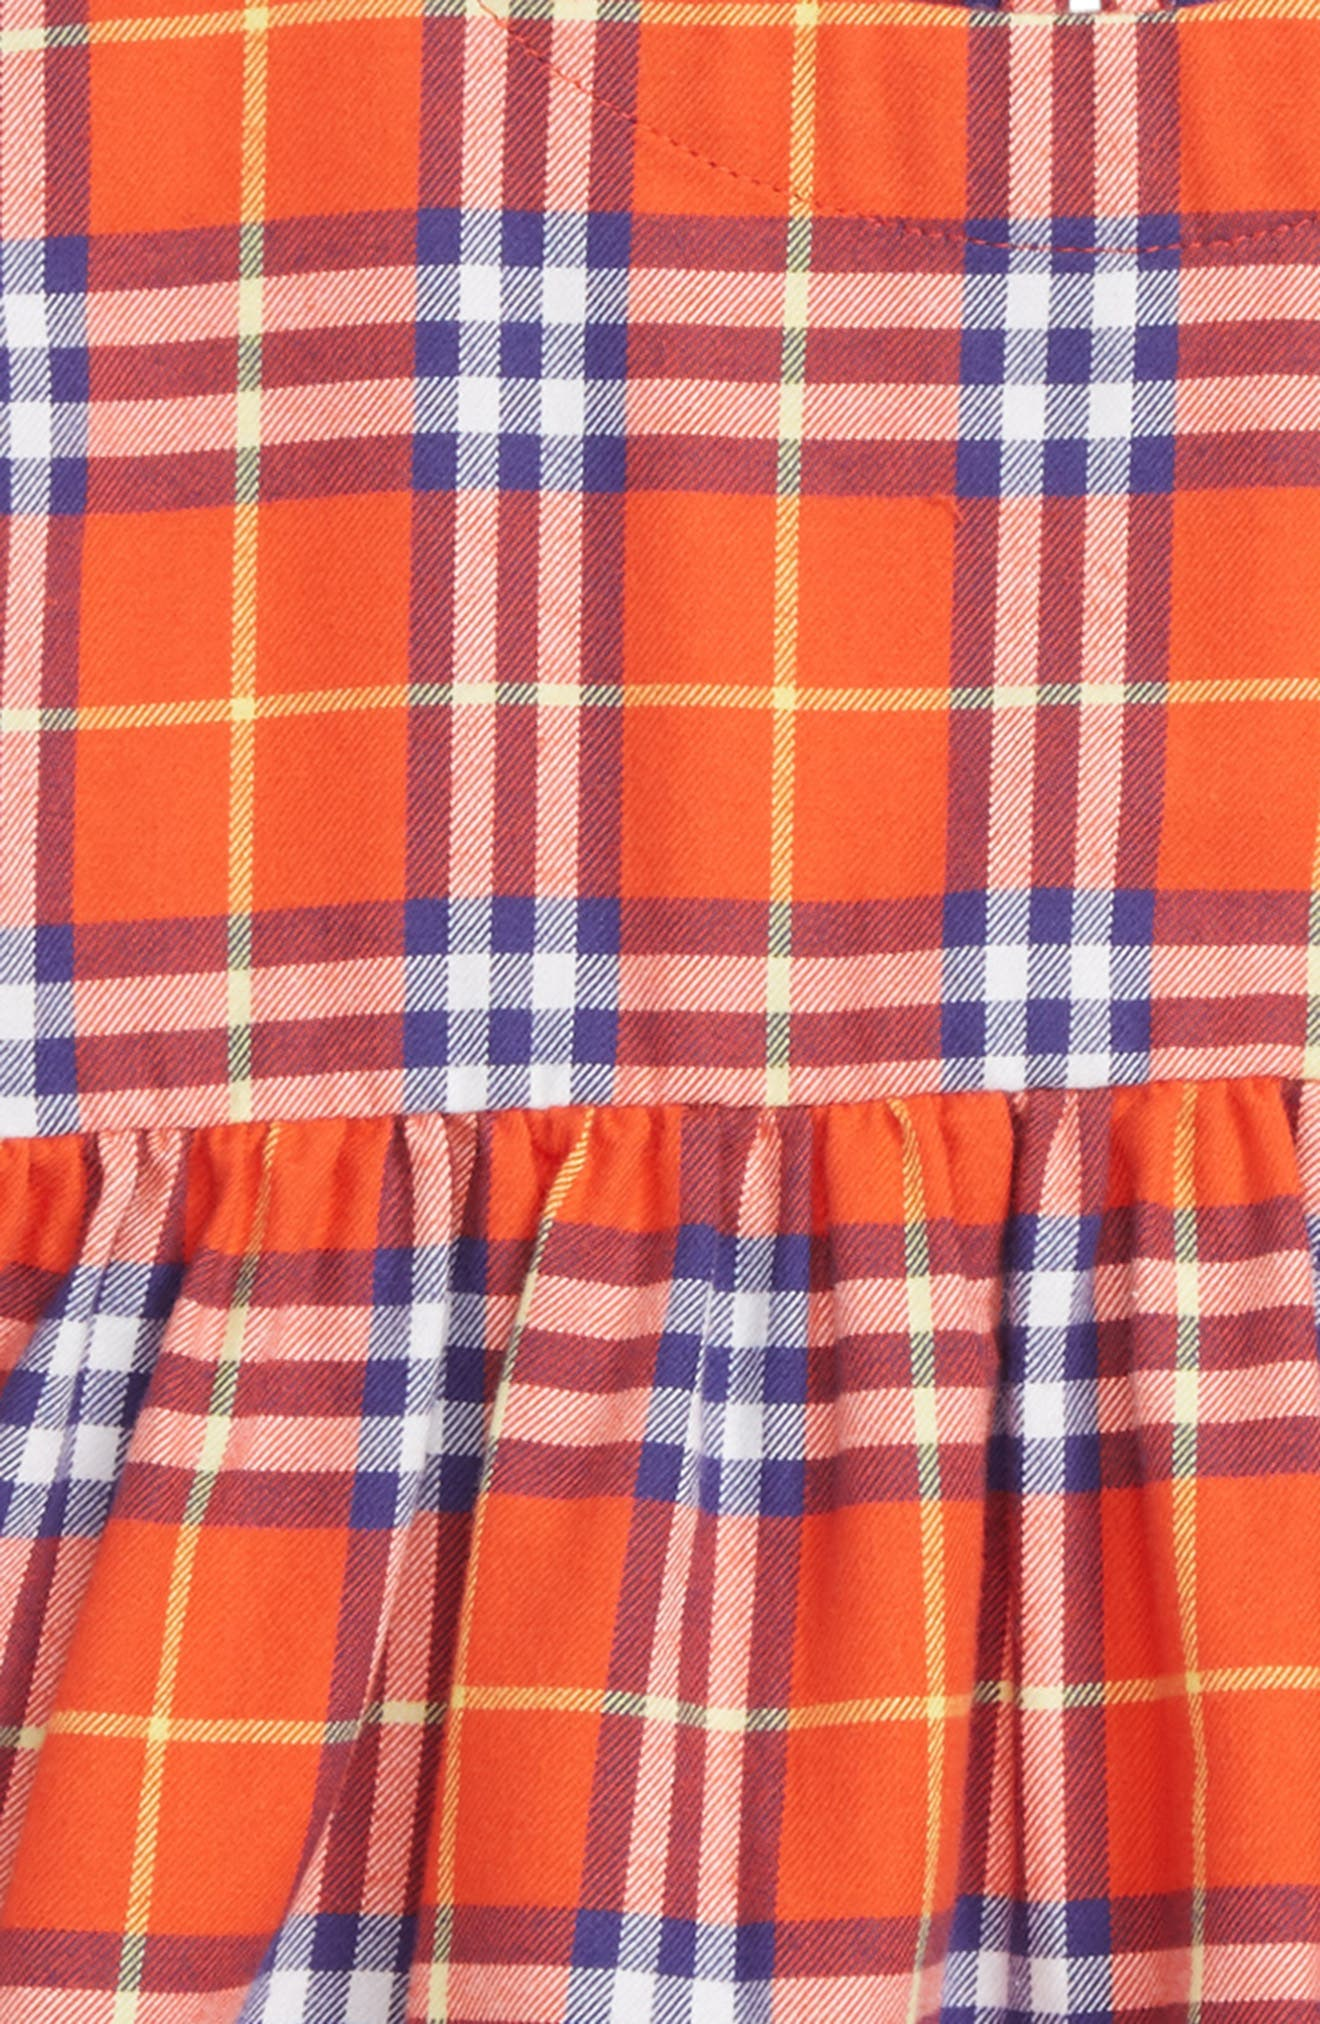 Alima Check Dress,                             Alternate thumbnail 2, color,                             ORANGE RED CHK